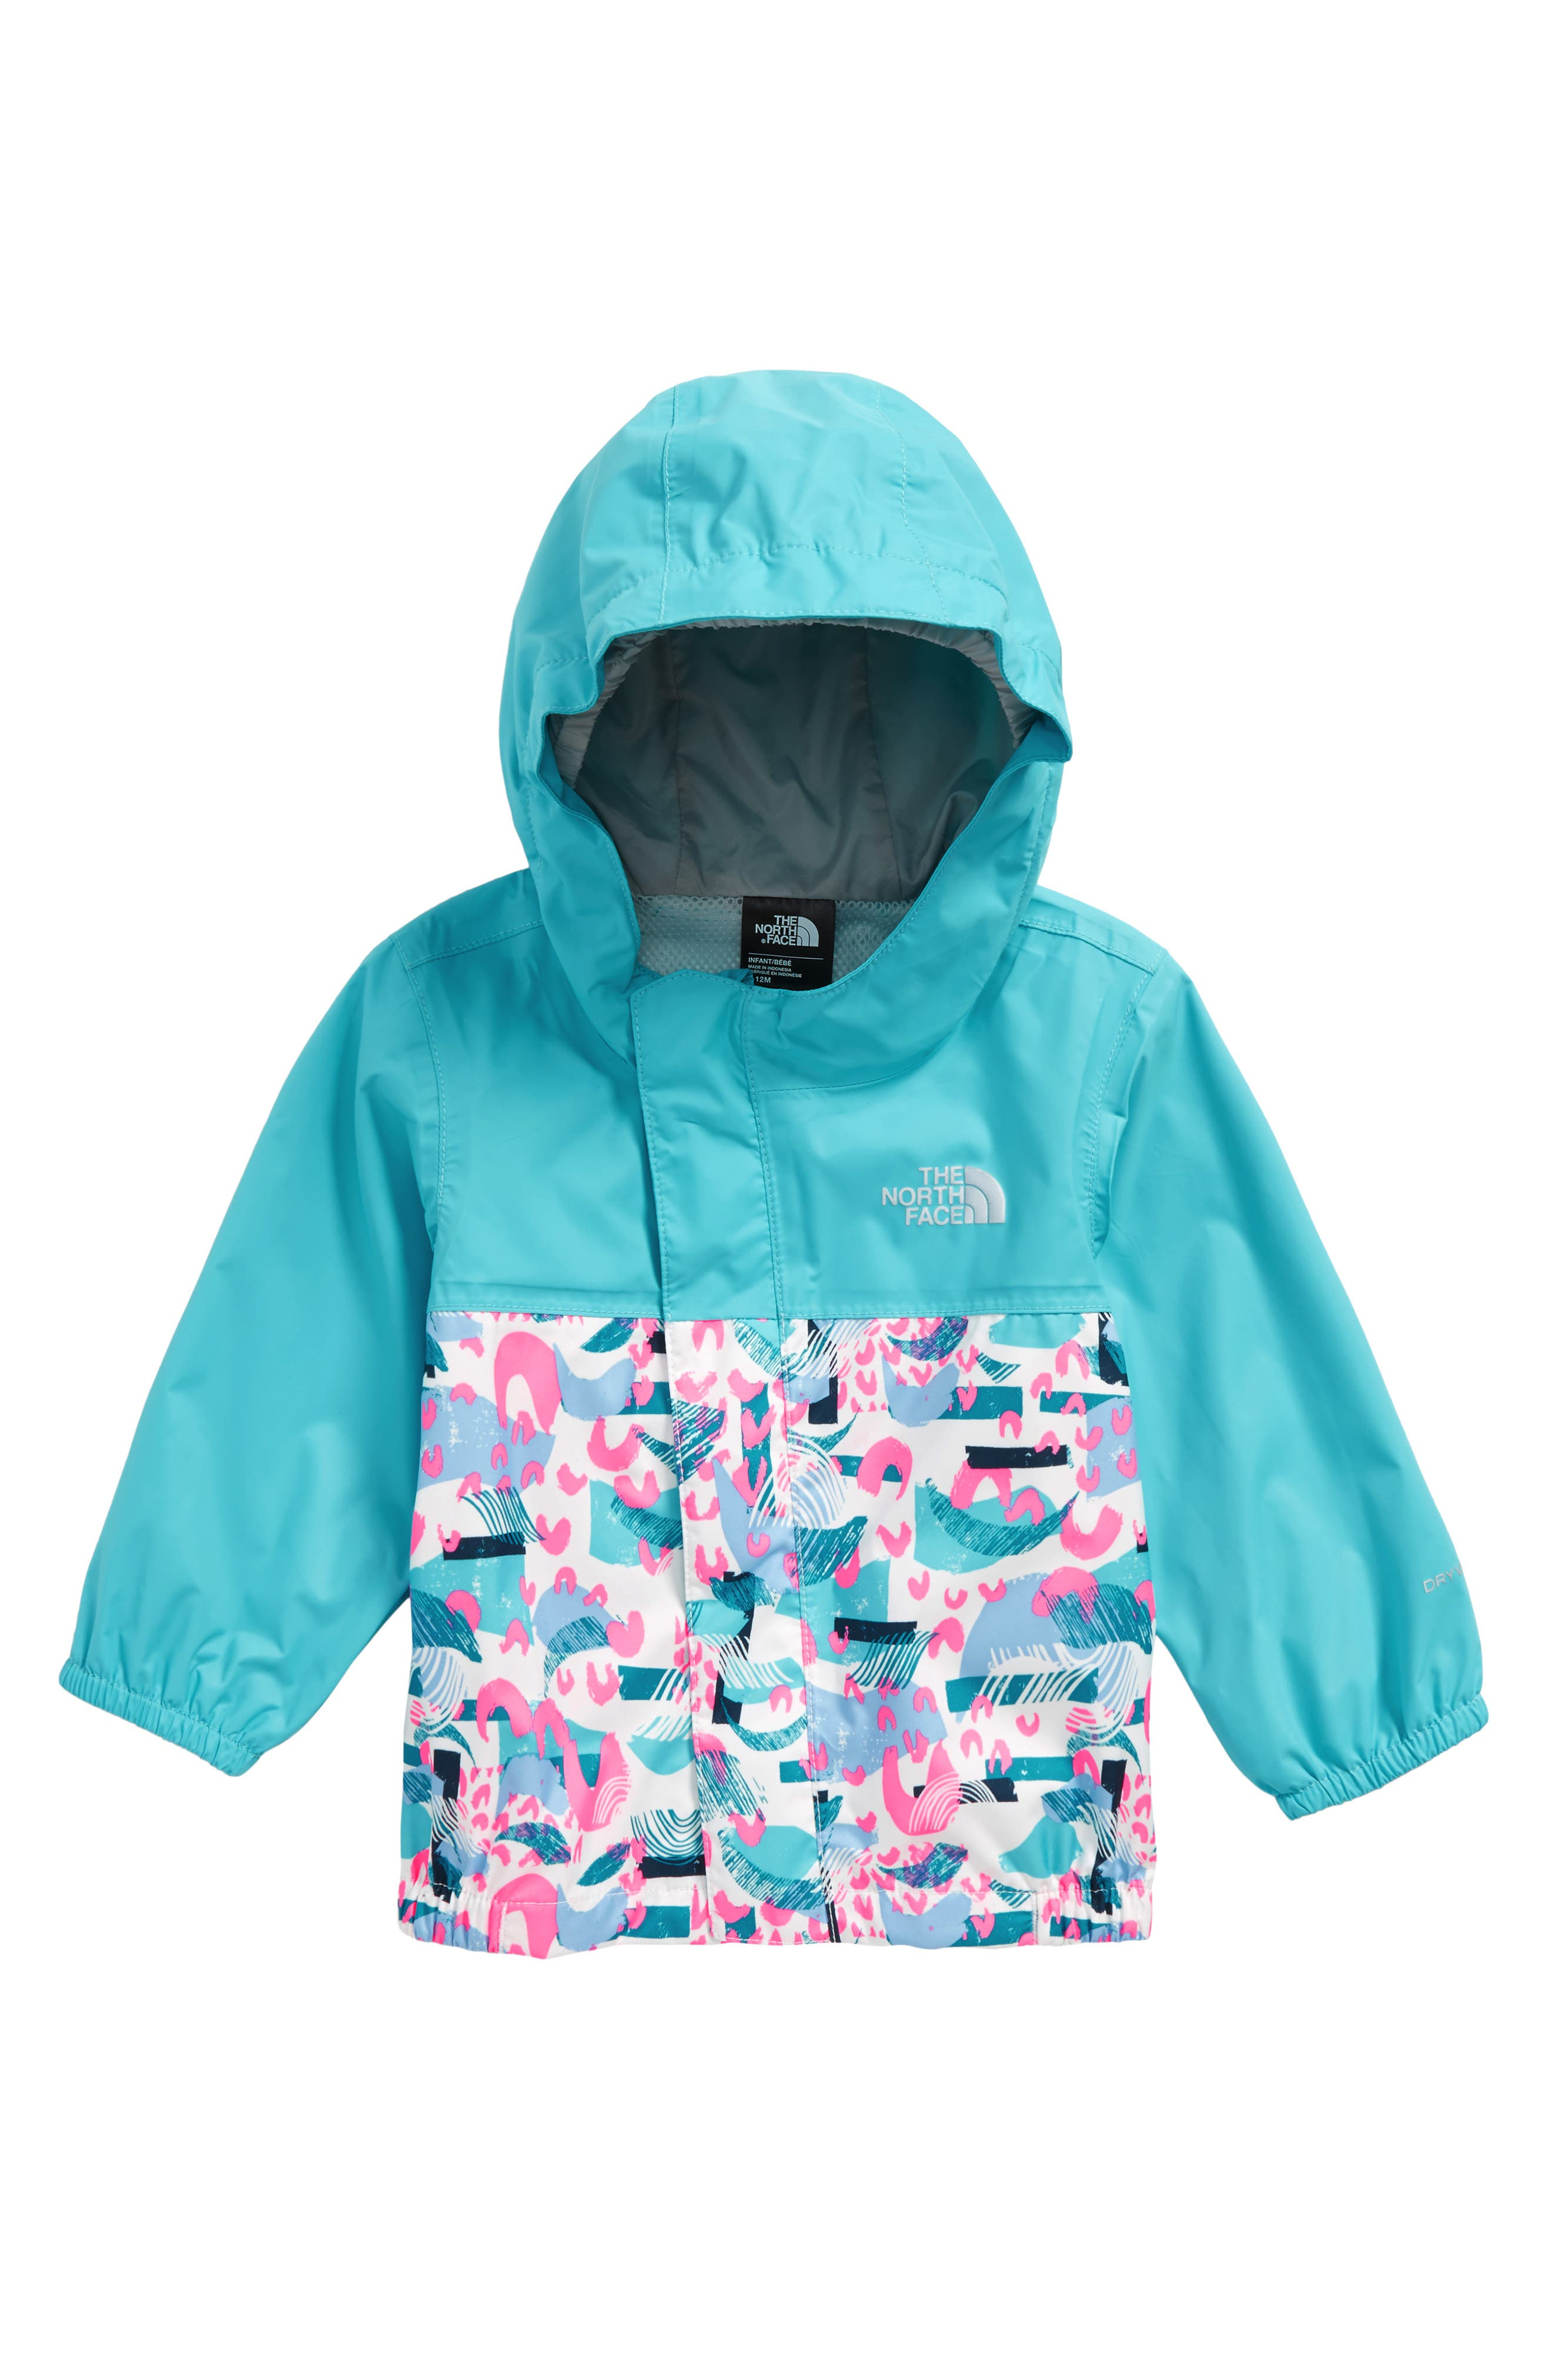 Tailout Hooded Rain Jacket,                             Main thumbnail 1, color,                             400